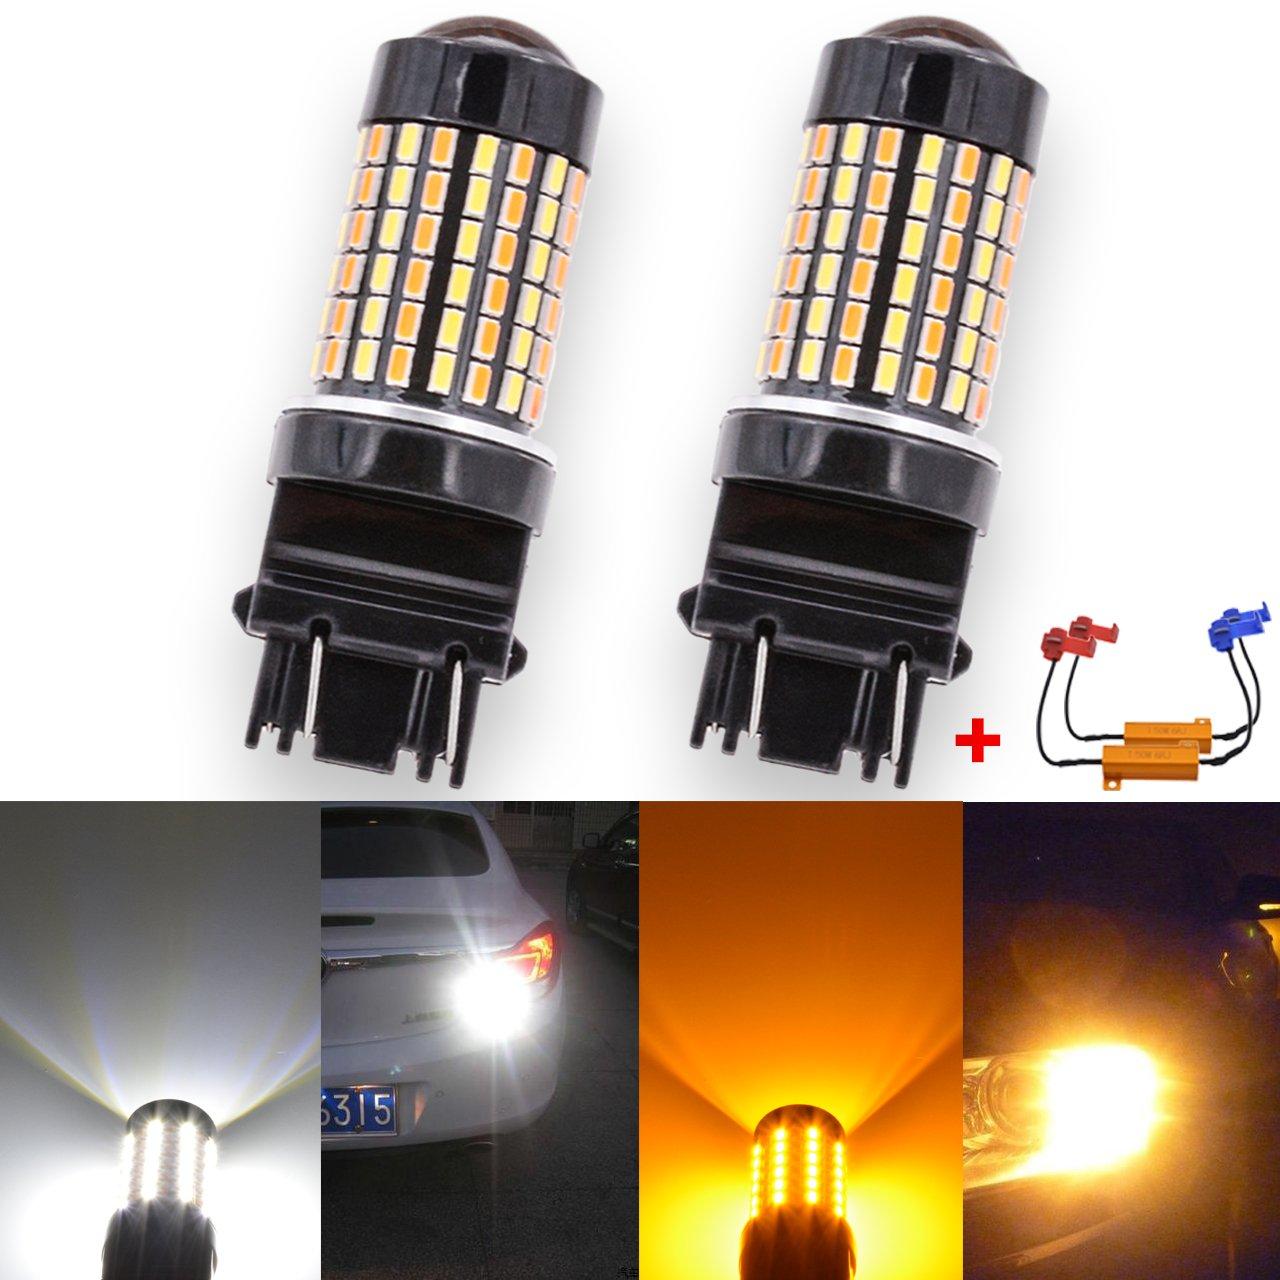 KaTur Cool White 6500K 800LM 7528 1157 BAY15D 1016 1034 Amber/White Switchback Amber-Off-Amber-Off Turn Signal LED Bulbs 3014-120SMD Lens Brake LED Light Lamp (Pack of 2) 2AM-CL-1249-1157